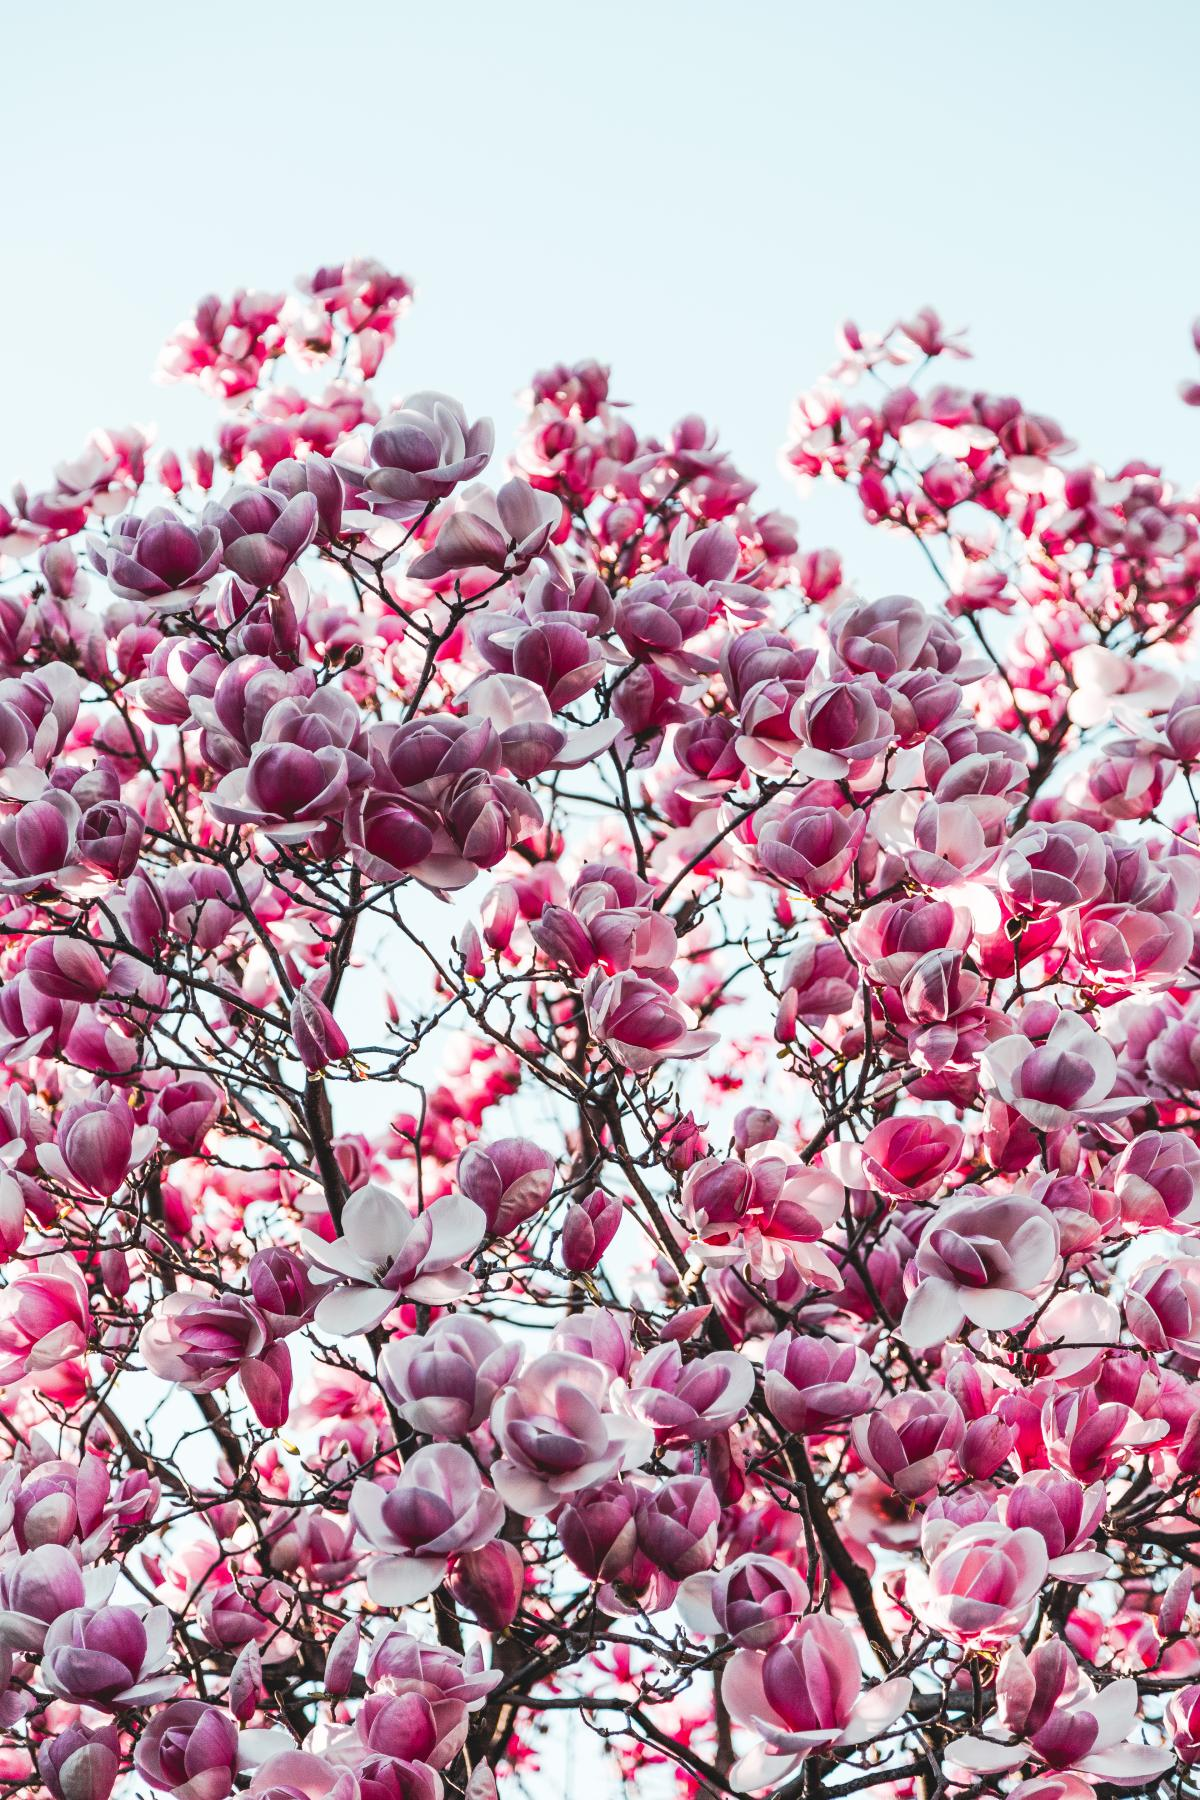 Purple and Pink Sakura Tree Photography #337722